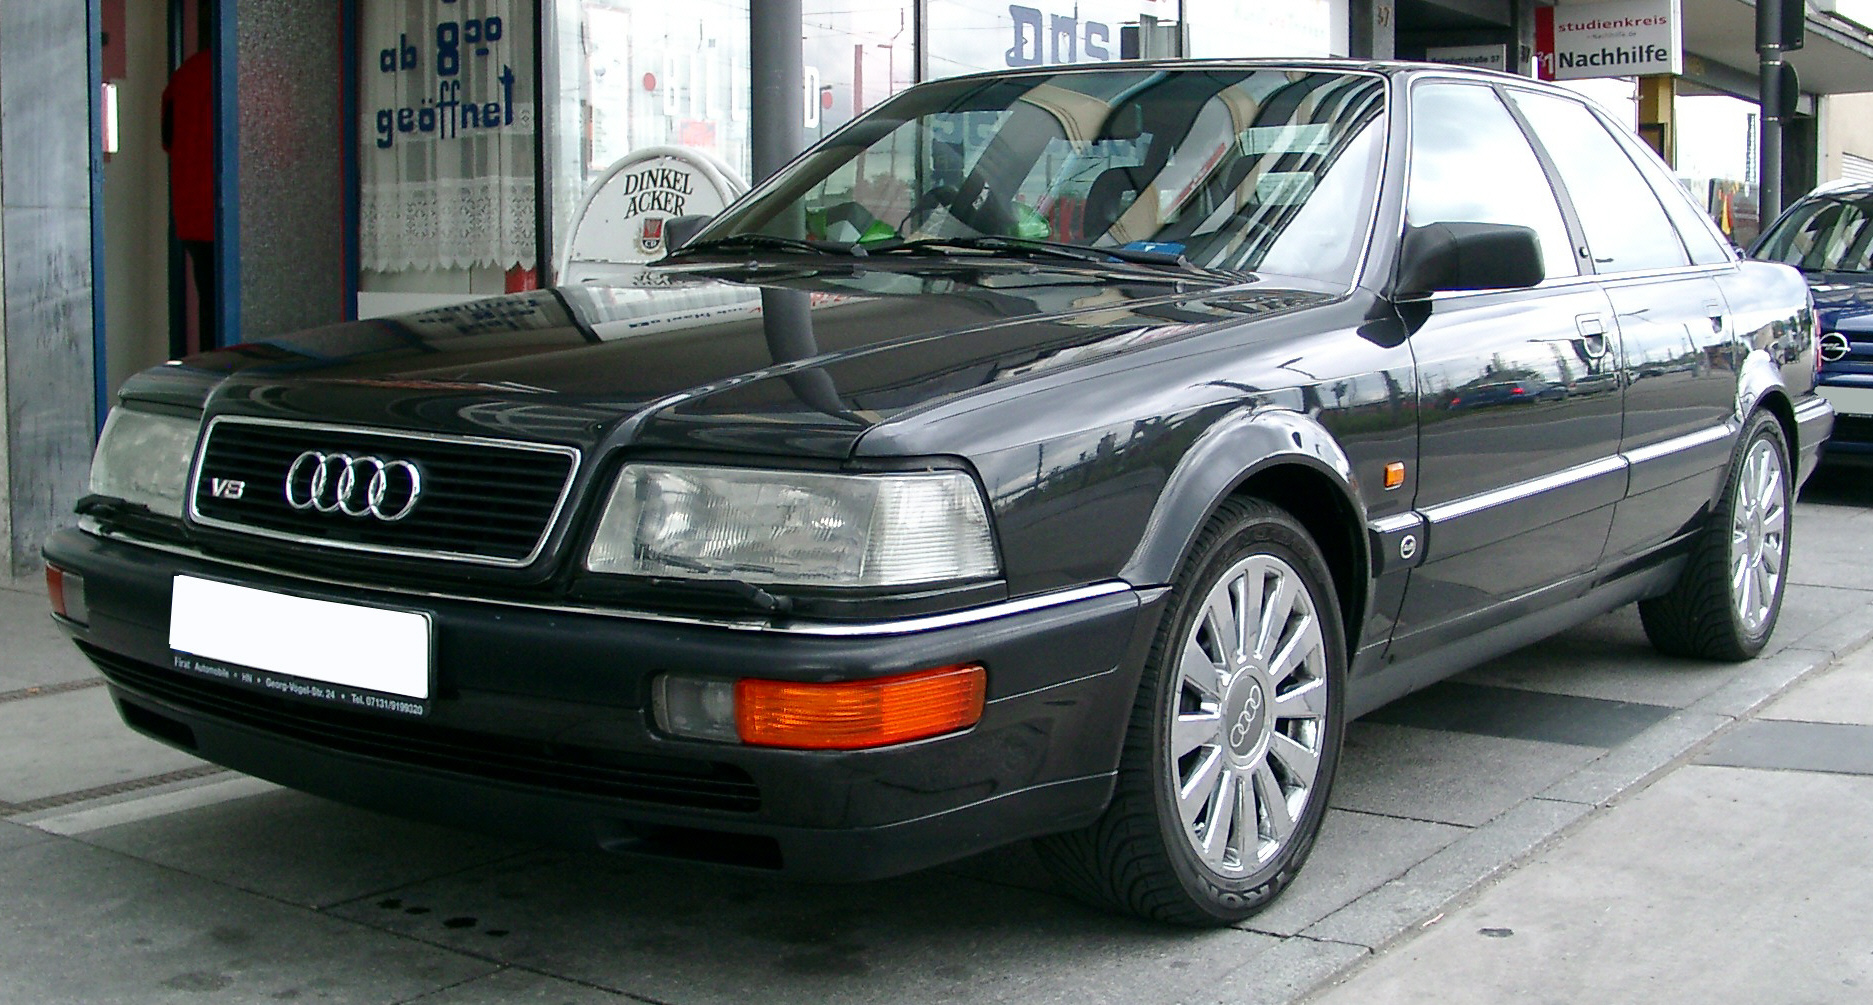 Kelebihan Audi V8 Tangguh